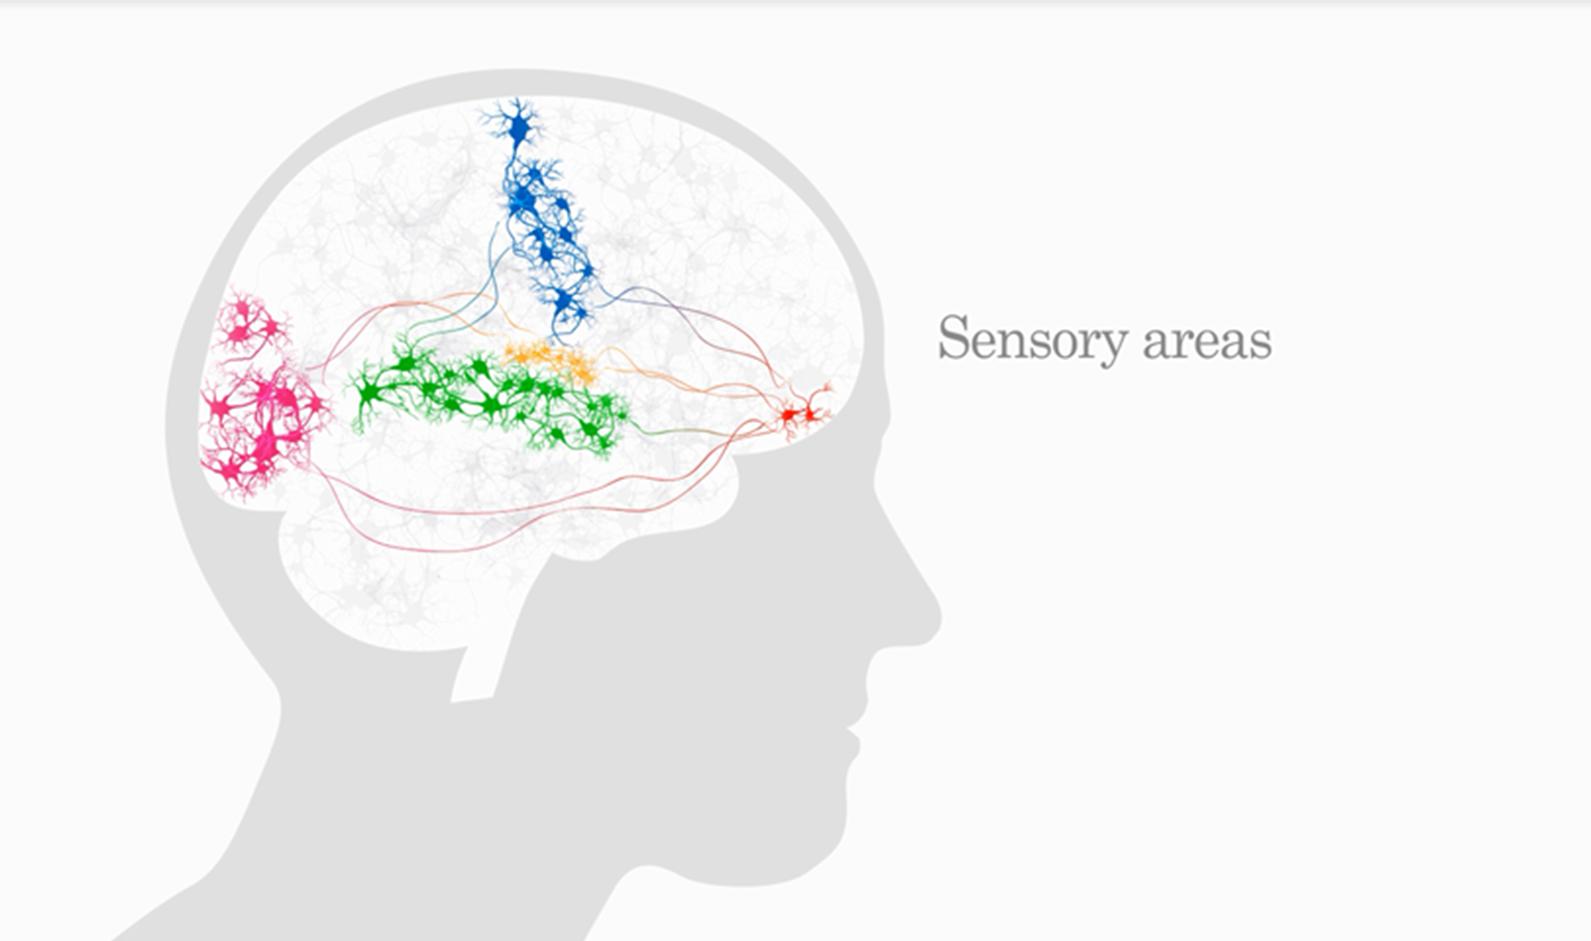 Synesthesia- Sensory areas of the brain